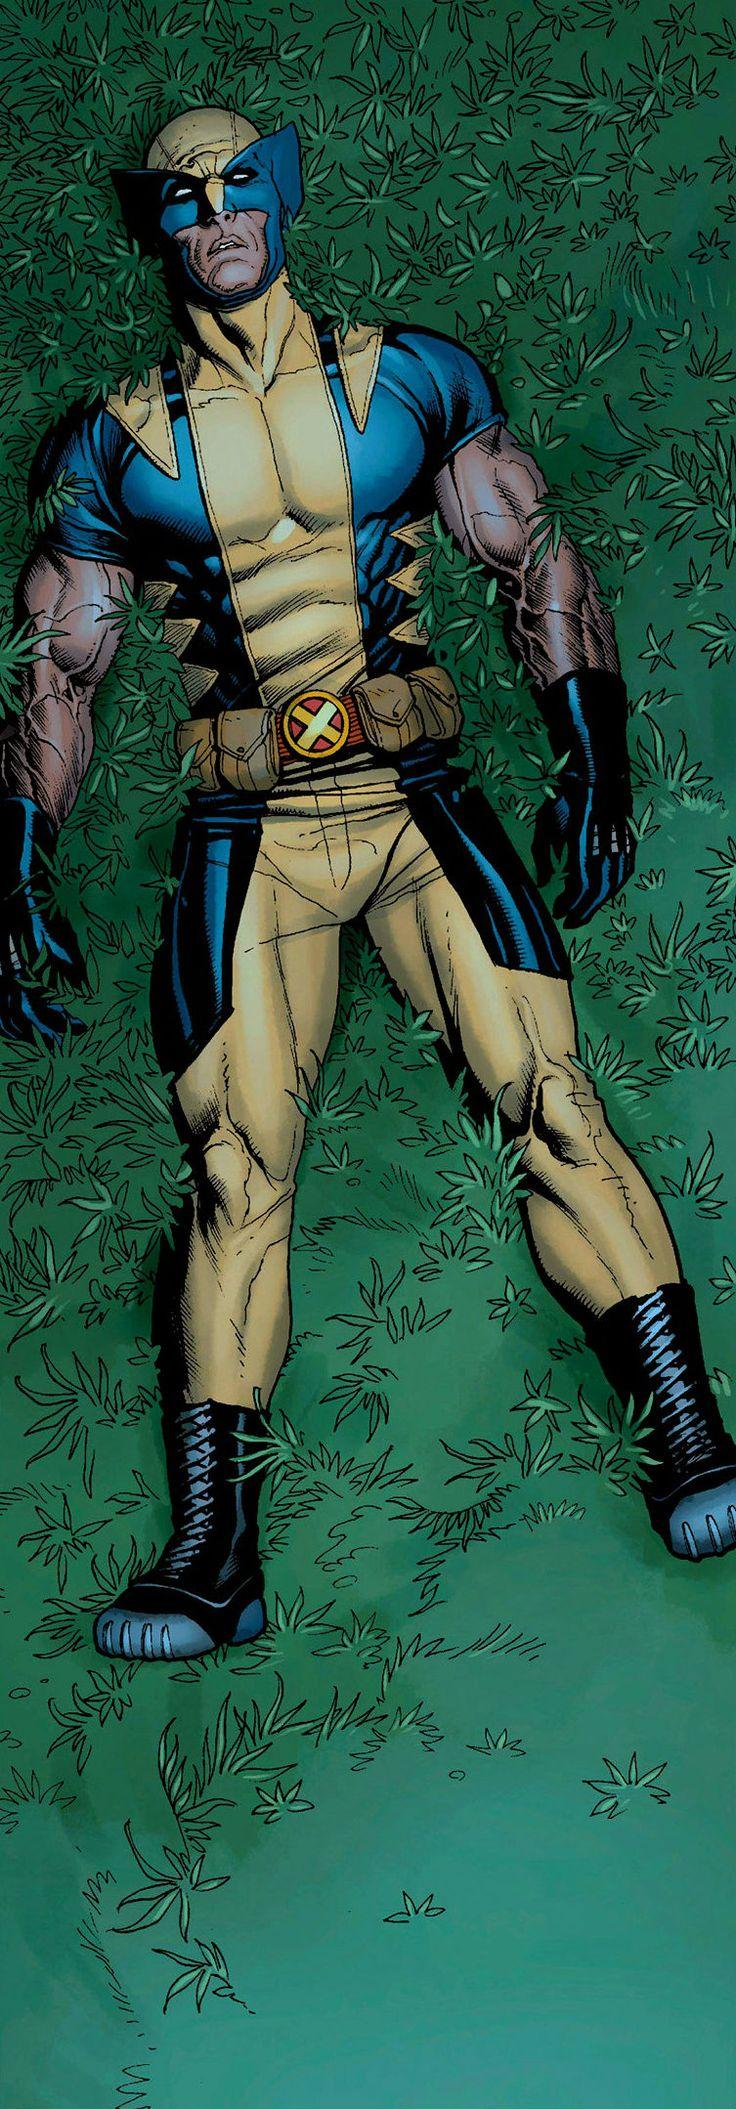 Wolverine by Frank Cho - #art #comics #comicbooks #superheroes